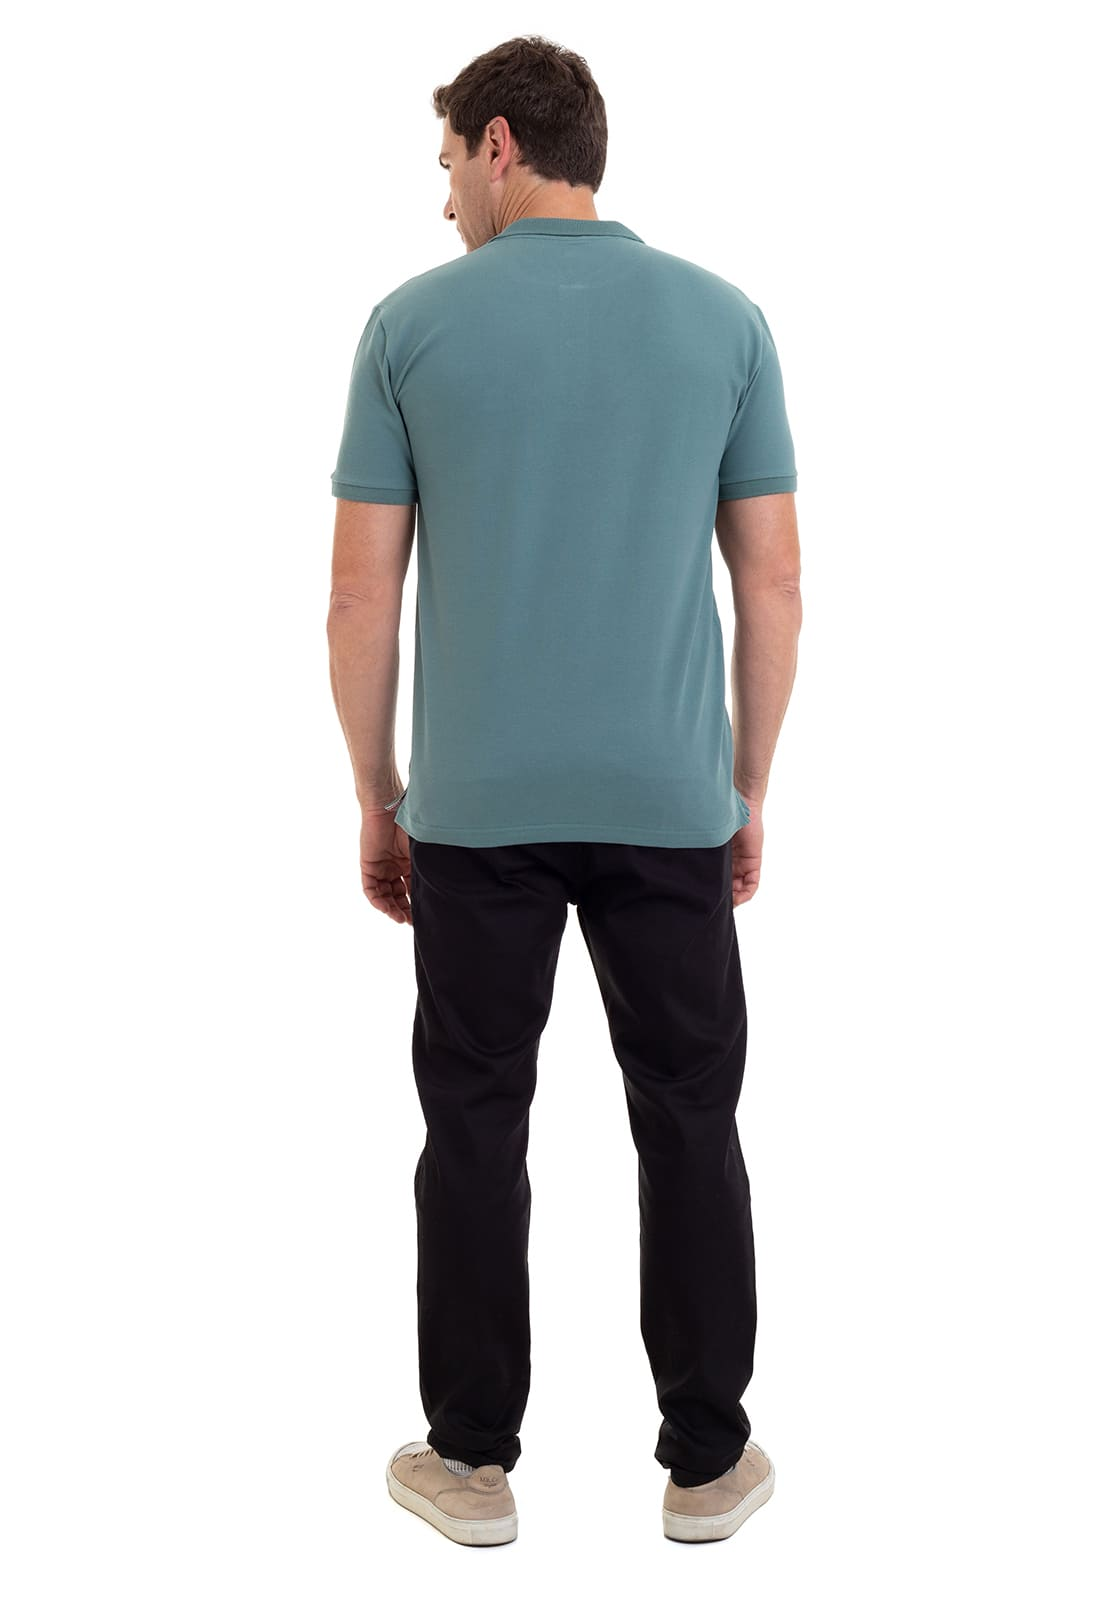 Camiseta Polo Hifen Diferenciada